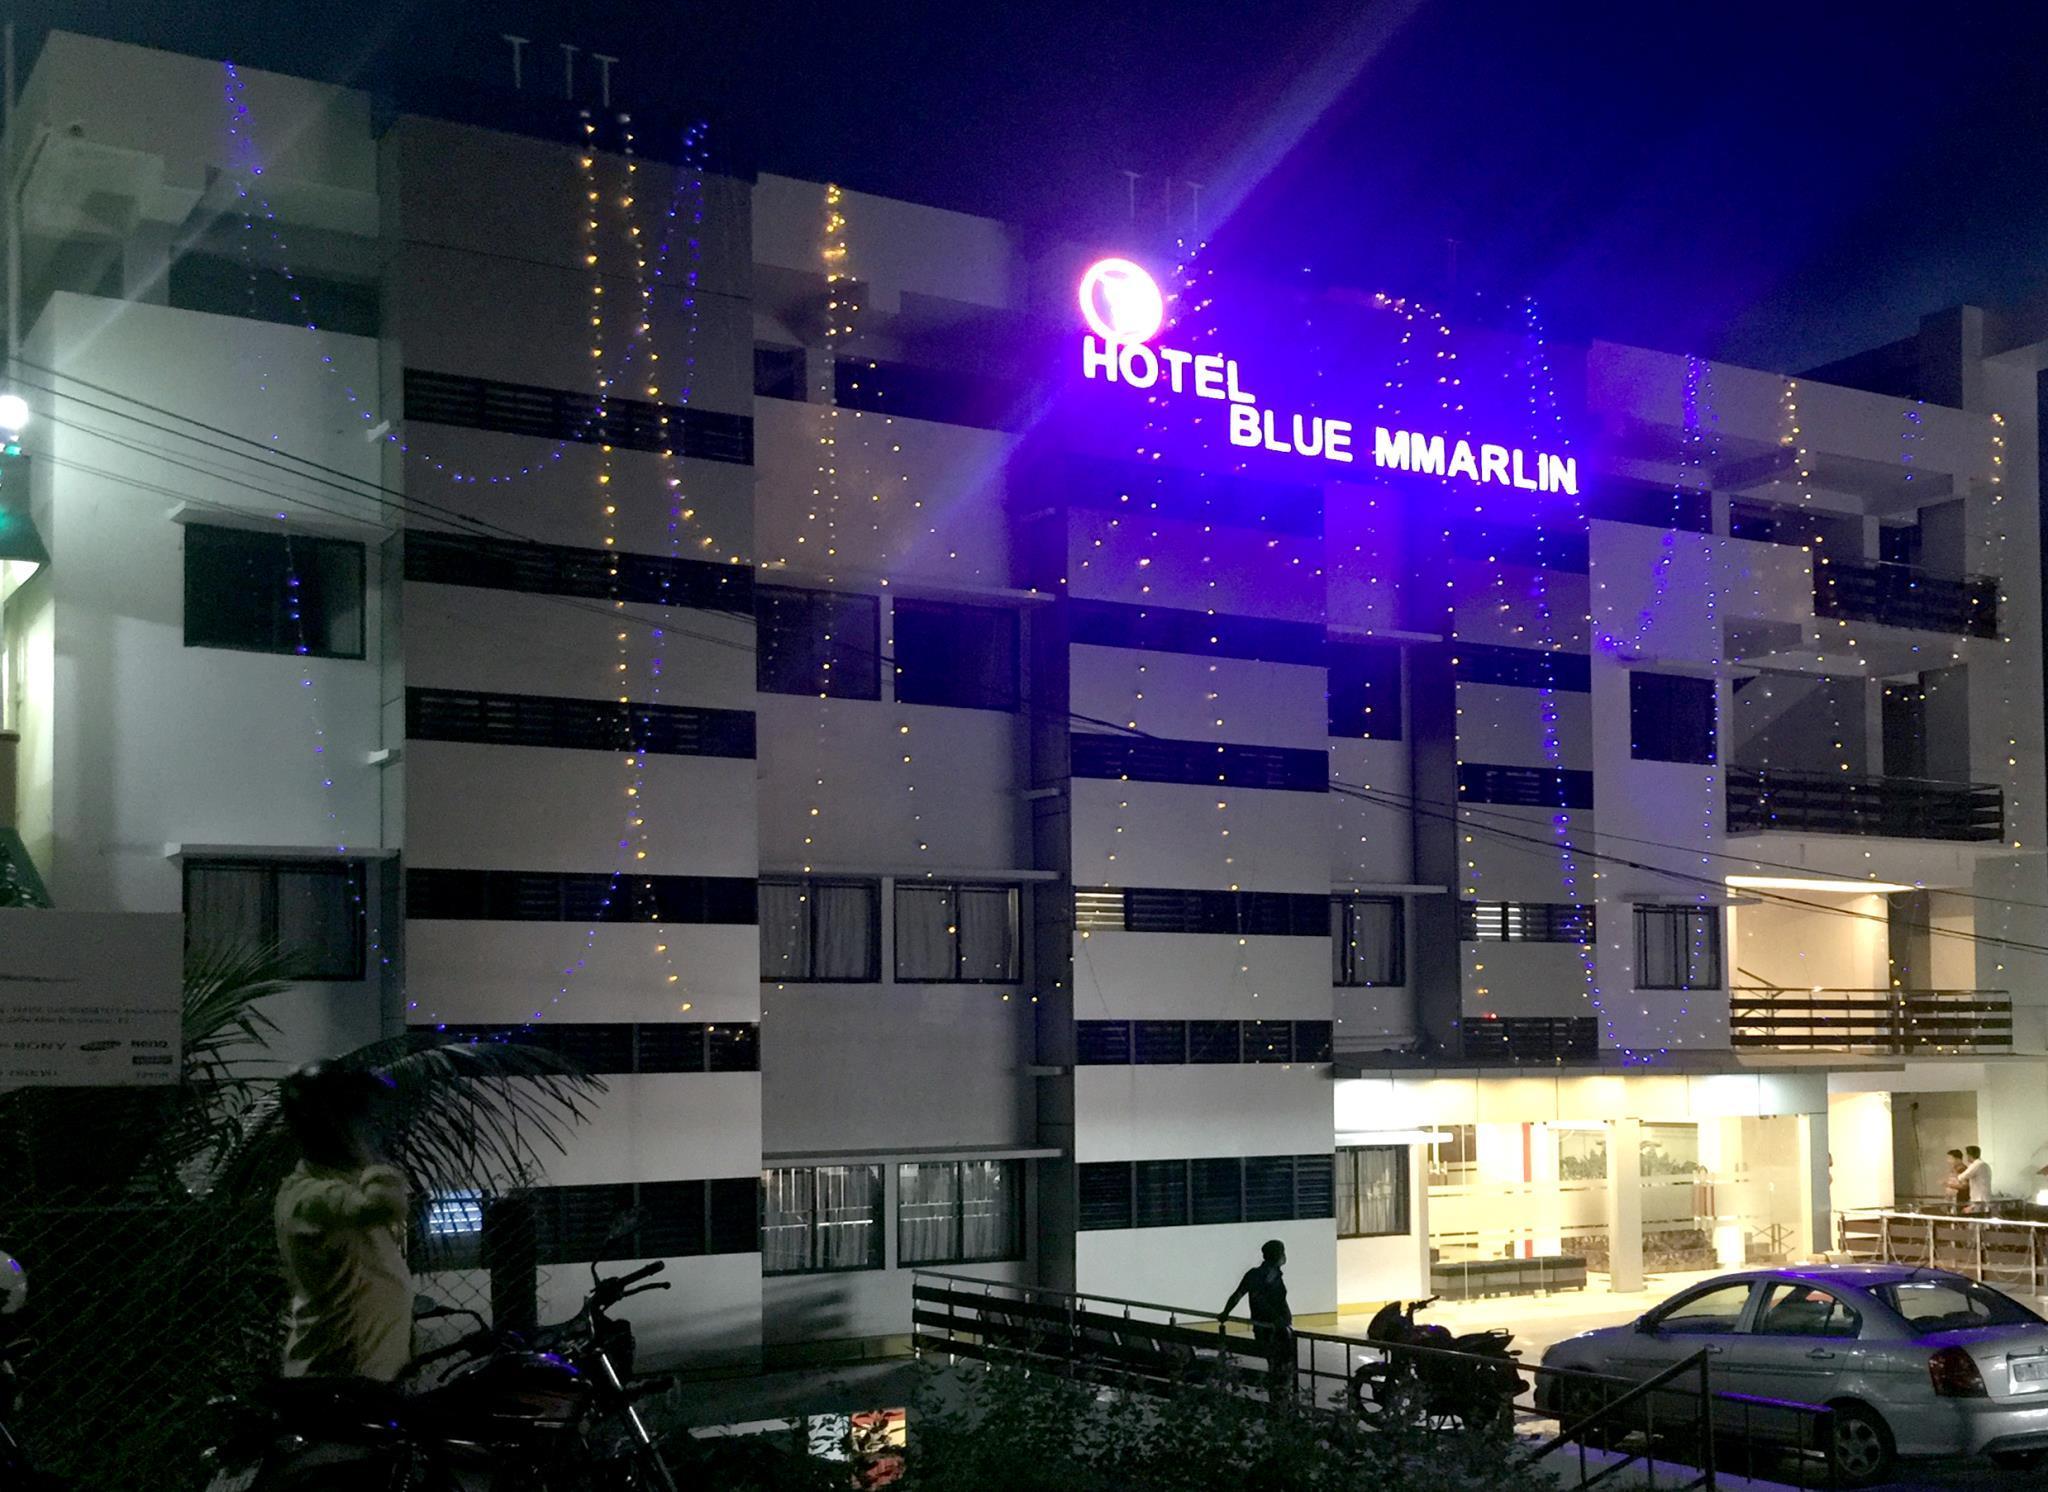 Hotel Blue Mmarlin Andaman And Nicobar Islands India